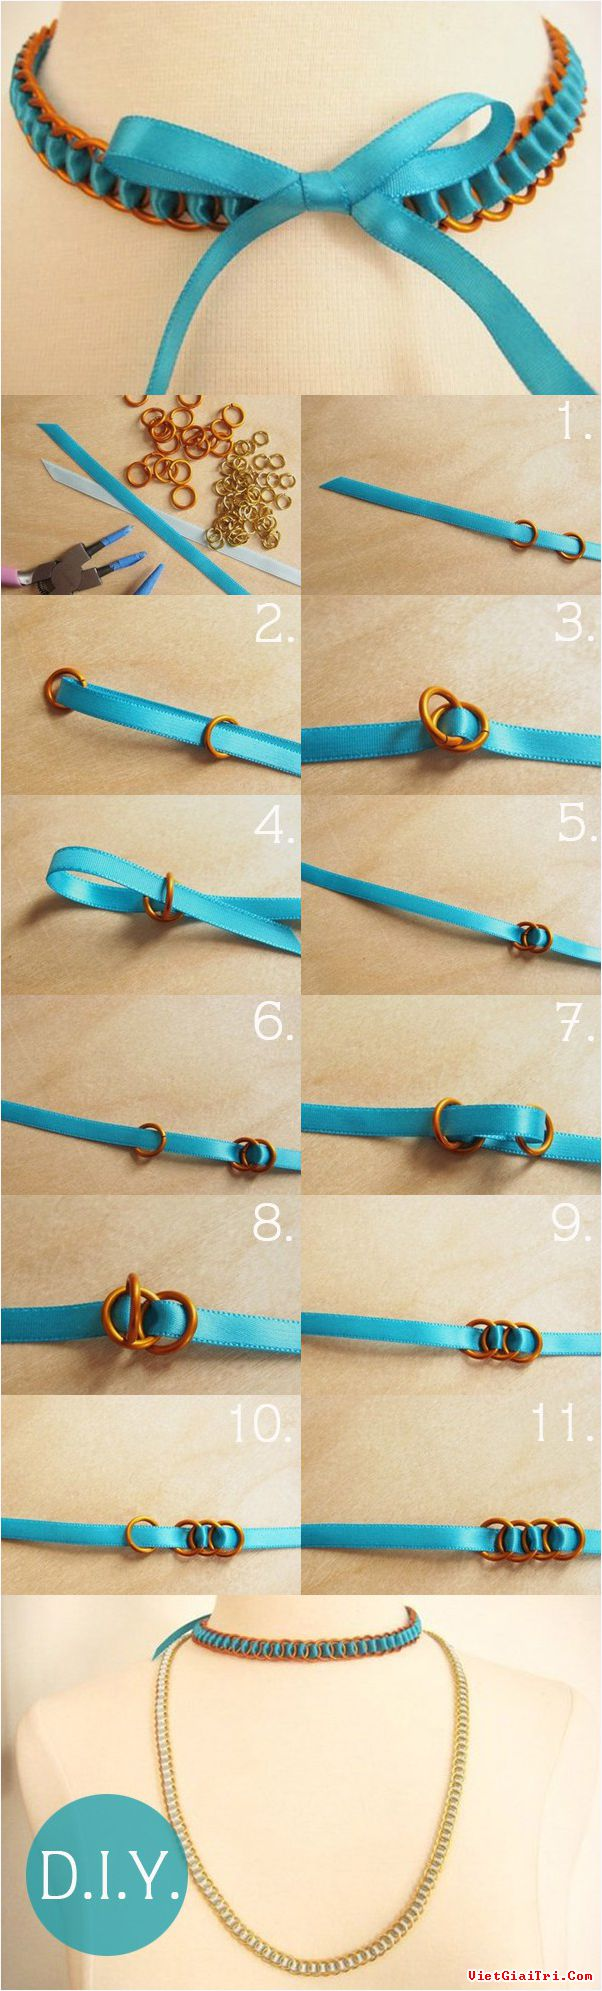 DIY Blue Chain Necklace Tutorial